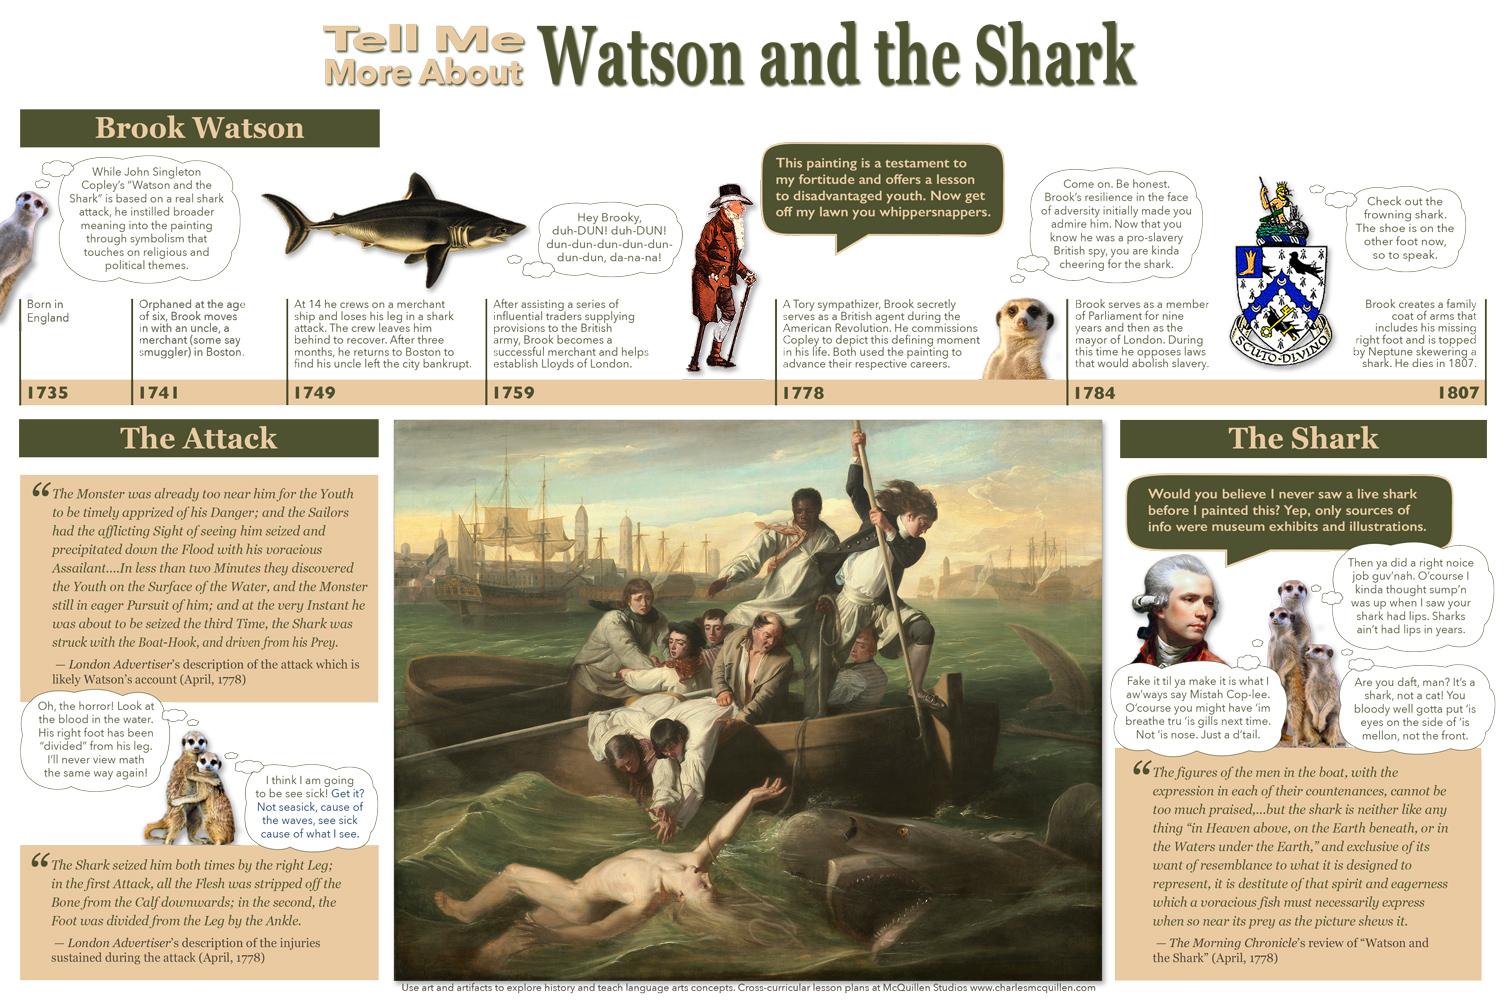 watson and the shark analysis